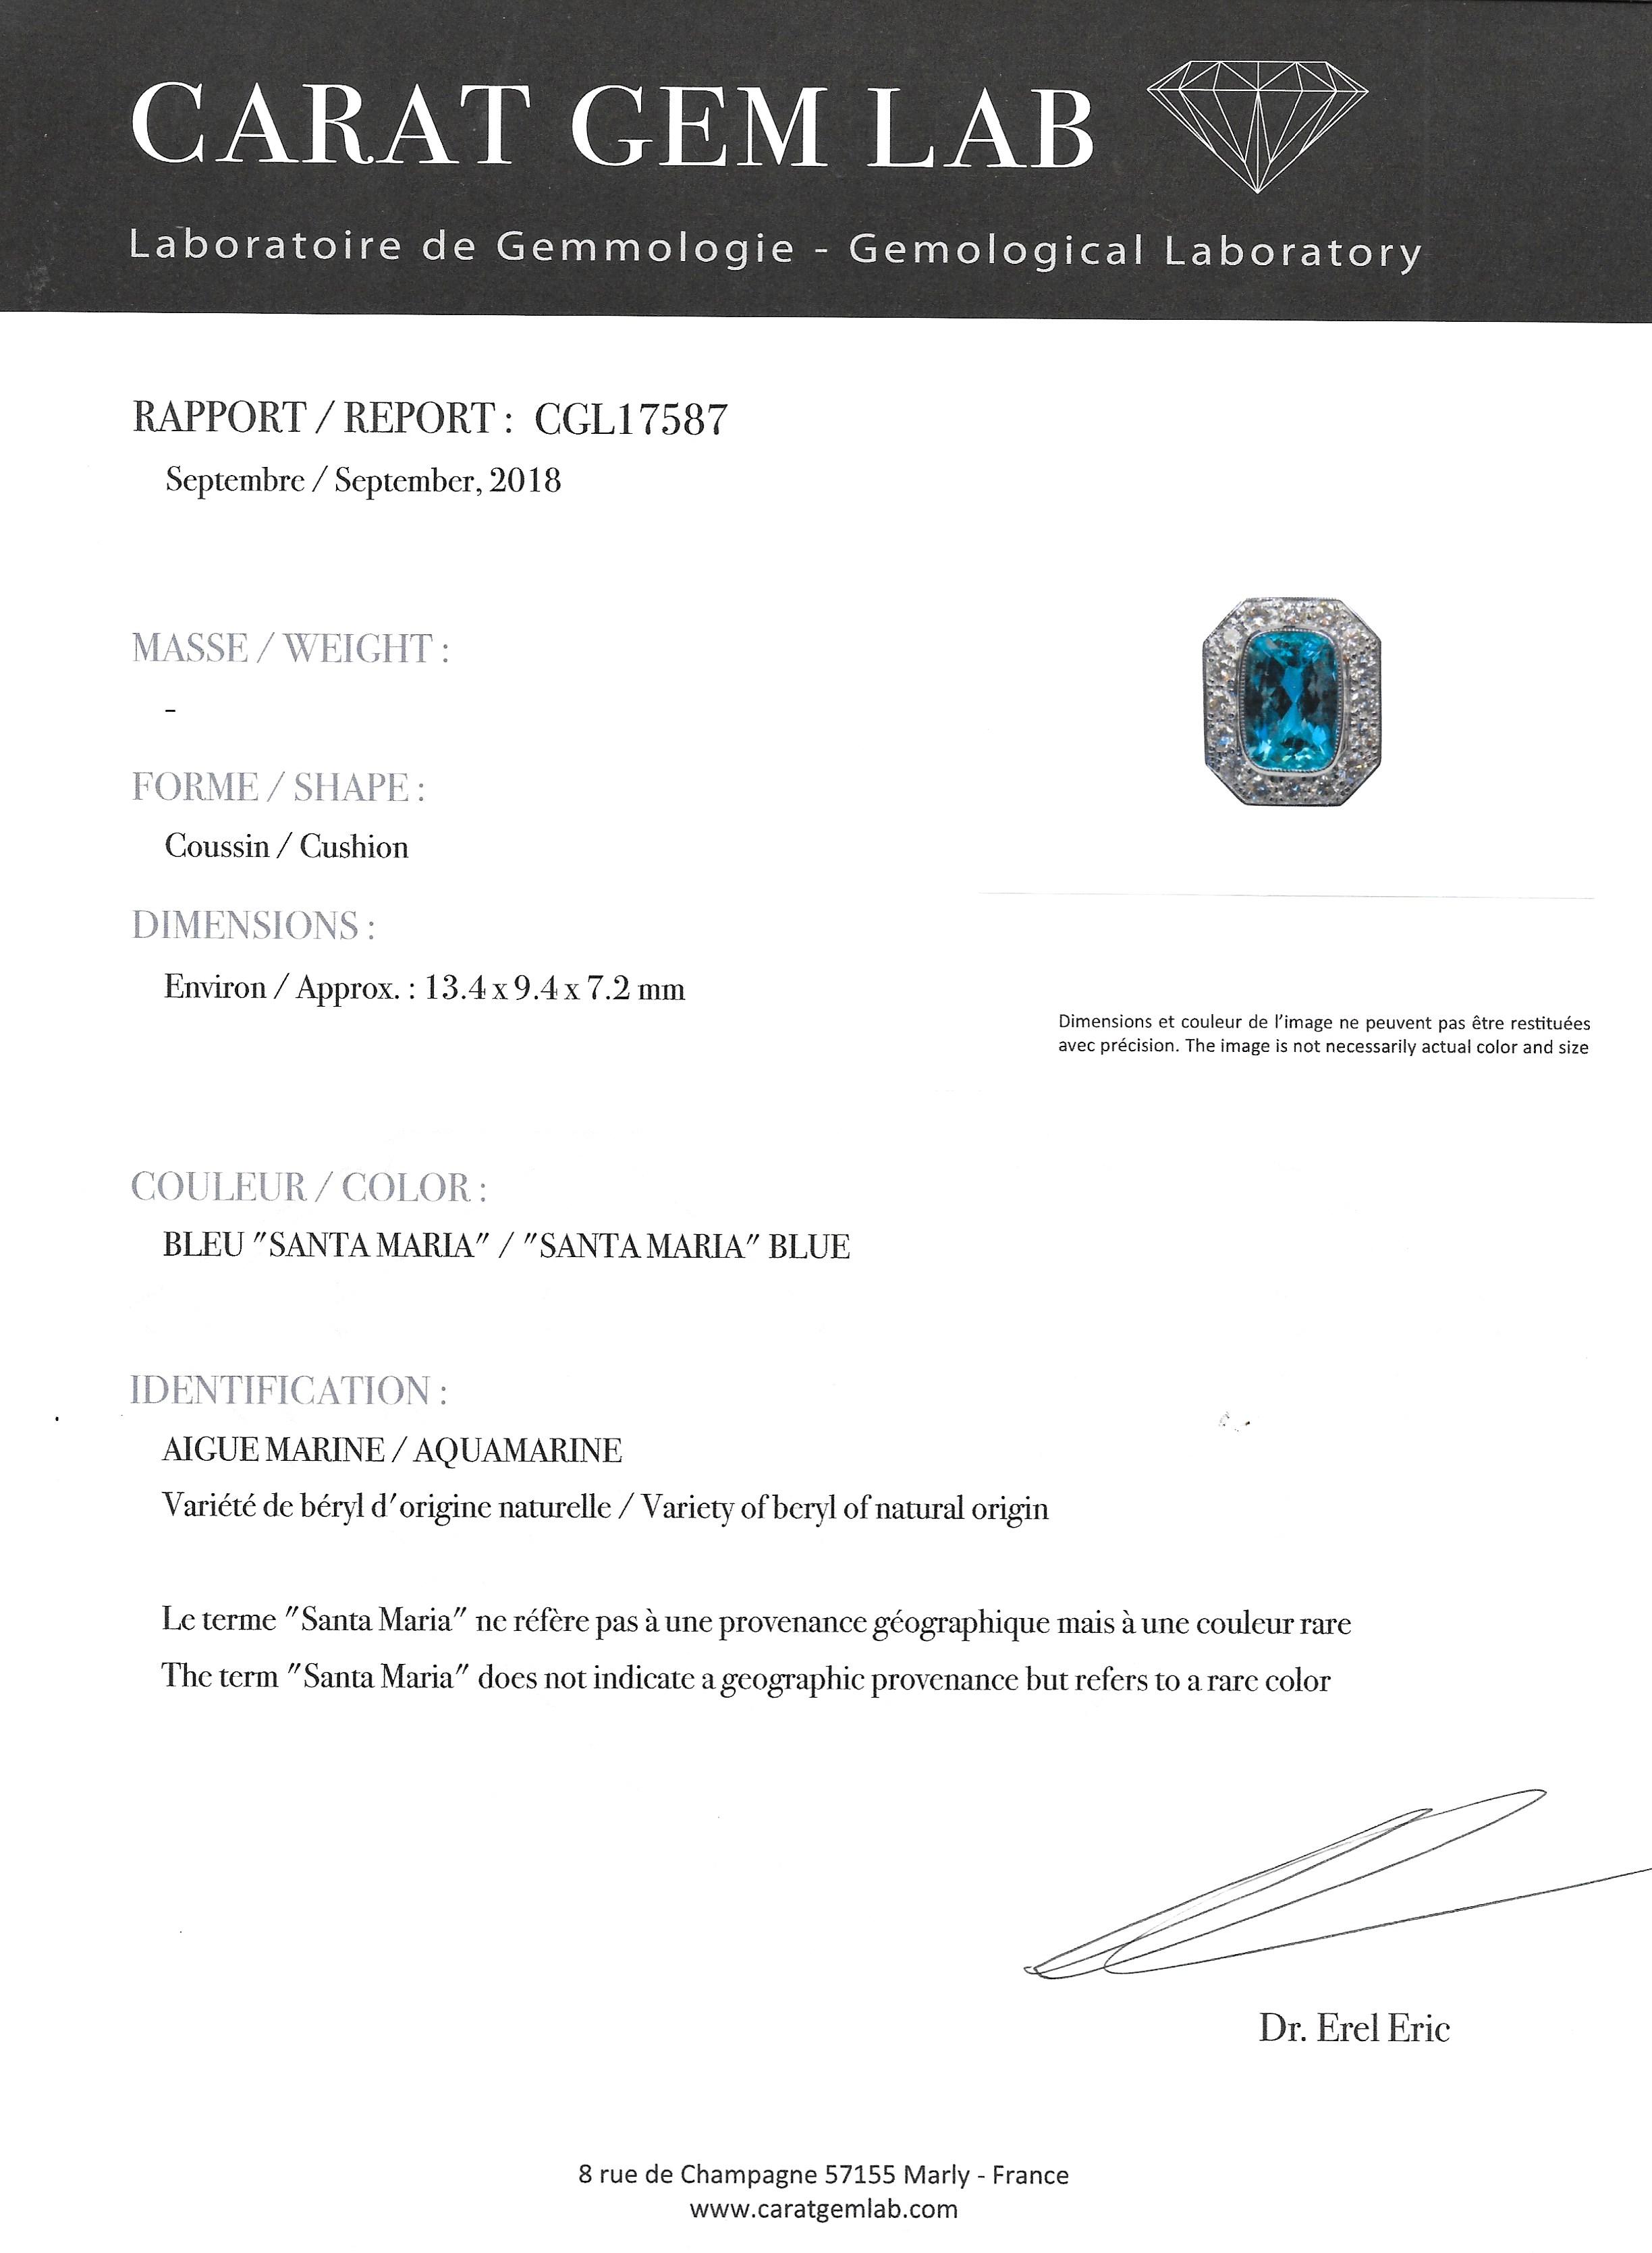 Bague aigue-marine Santa Maria (6 carats, certificat CGL) diamants-3